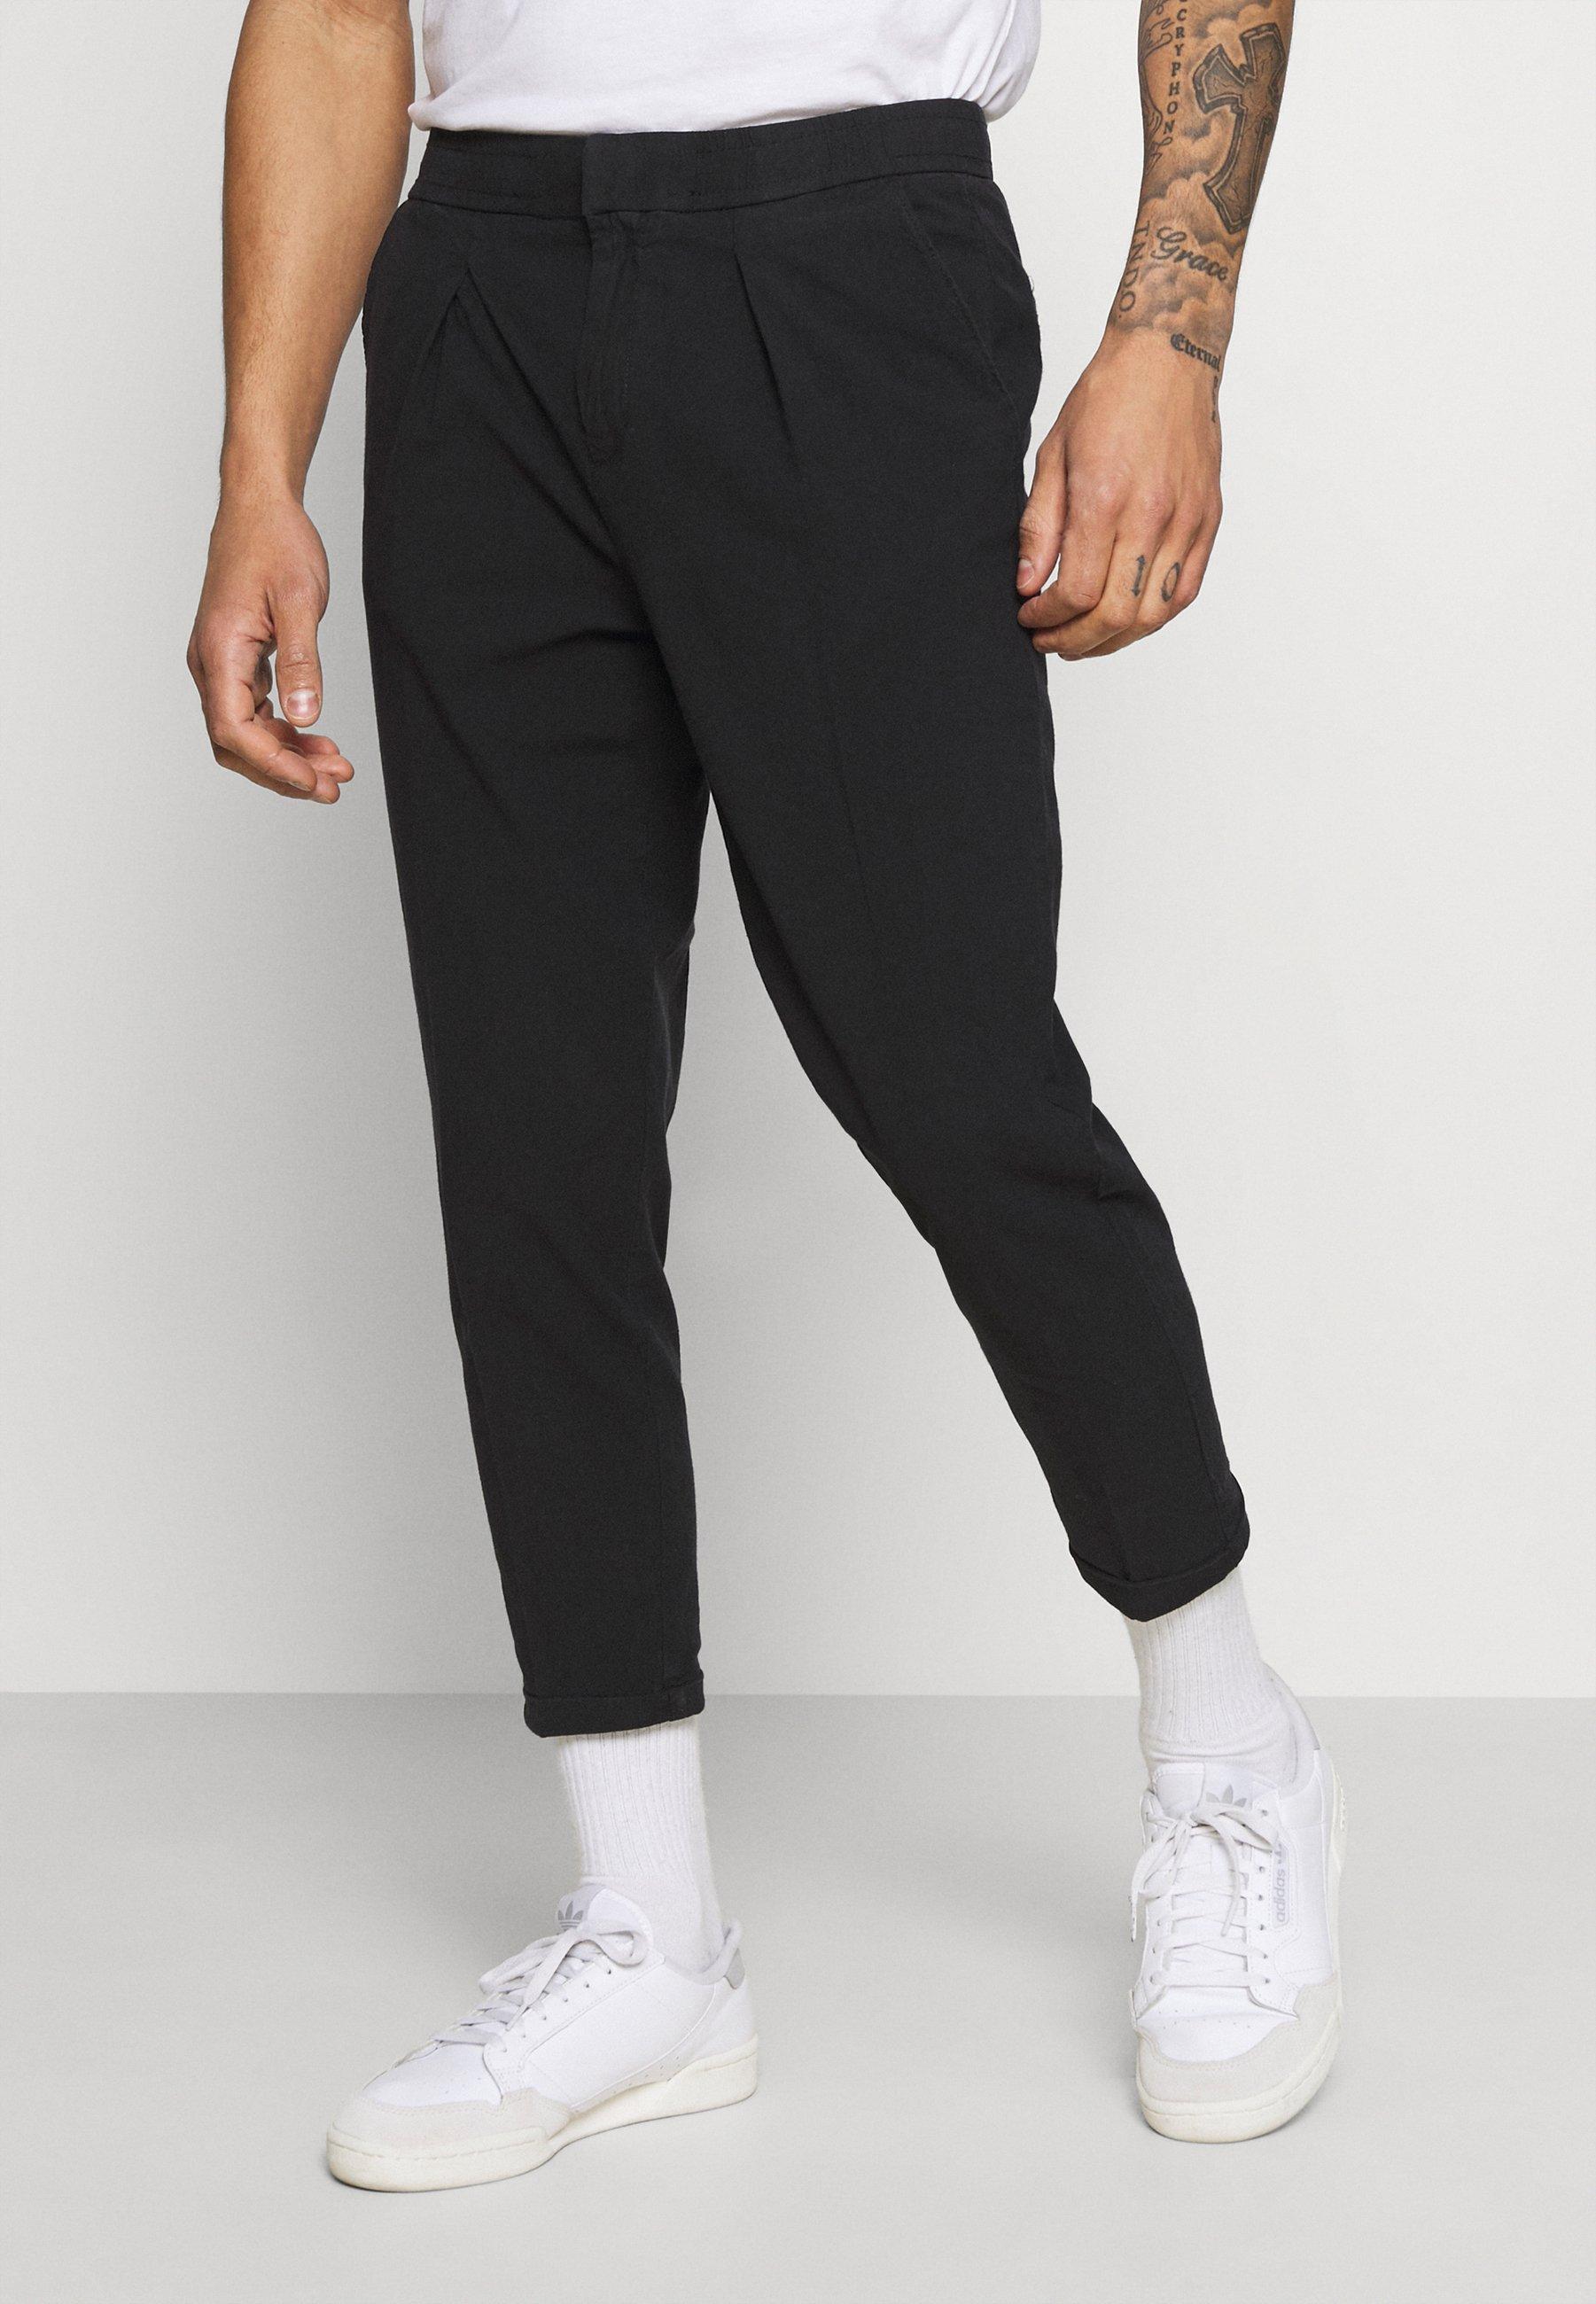 Uomo JOHNNY PANTS - Pantaloni